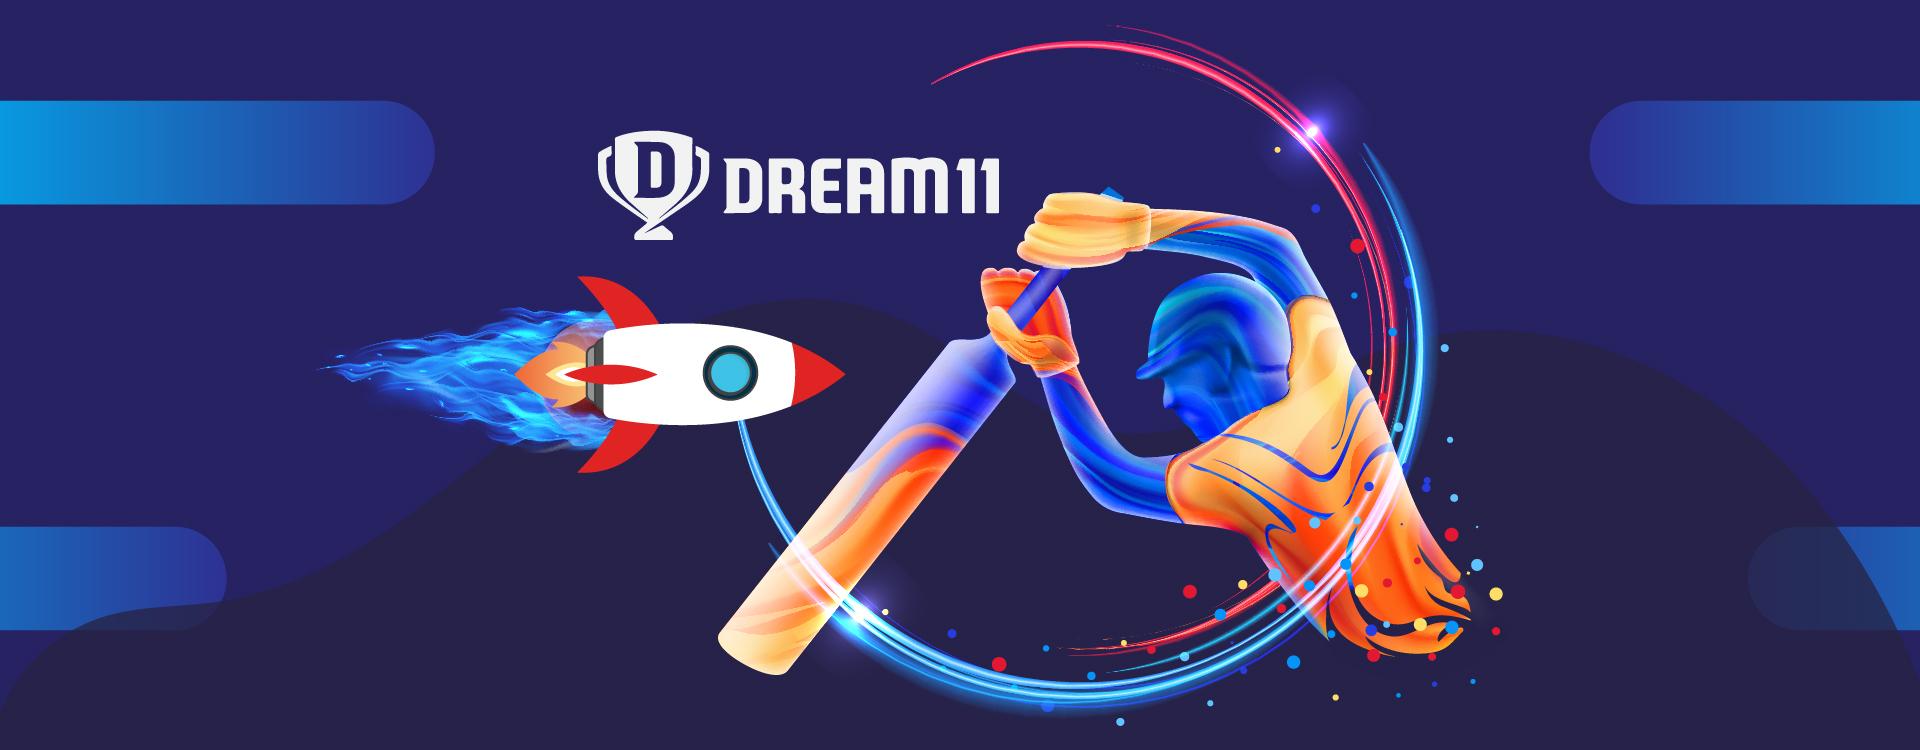 Dream11 IPL sponsor Fantasy partner IPL 2021